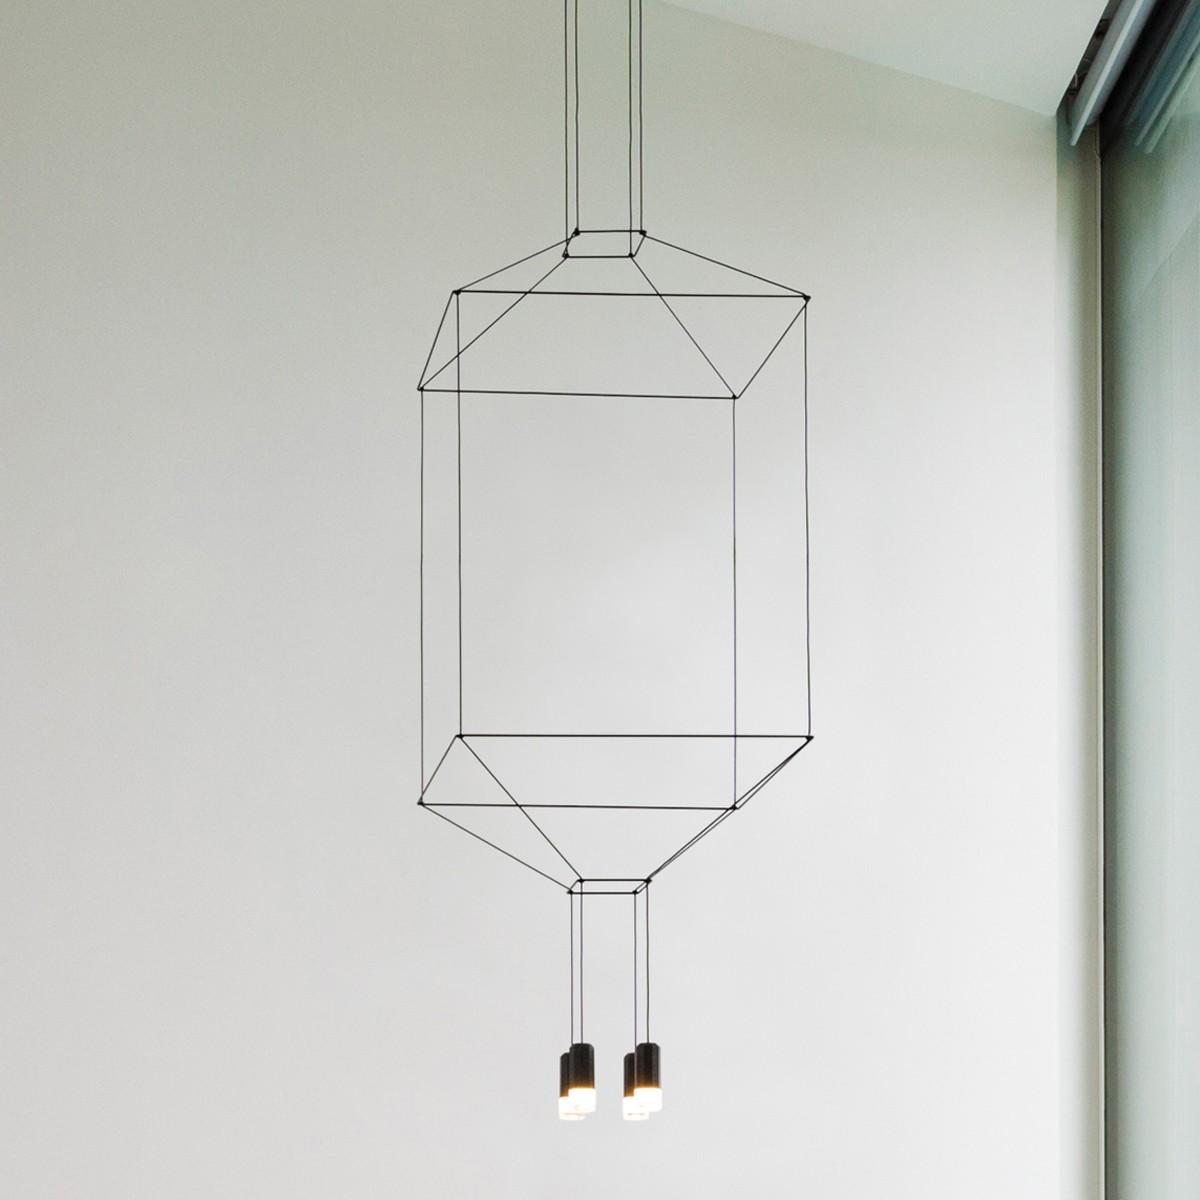 Vibia Wireflow Pendelleuchte, 4-flg., 80 x 80 cm, schwarz